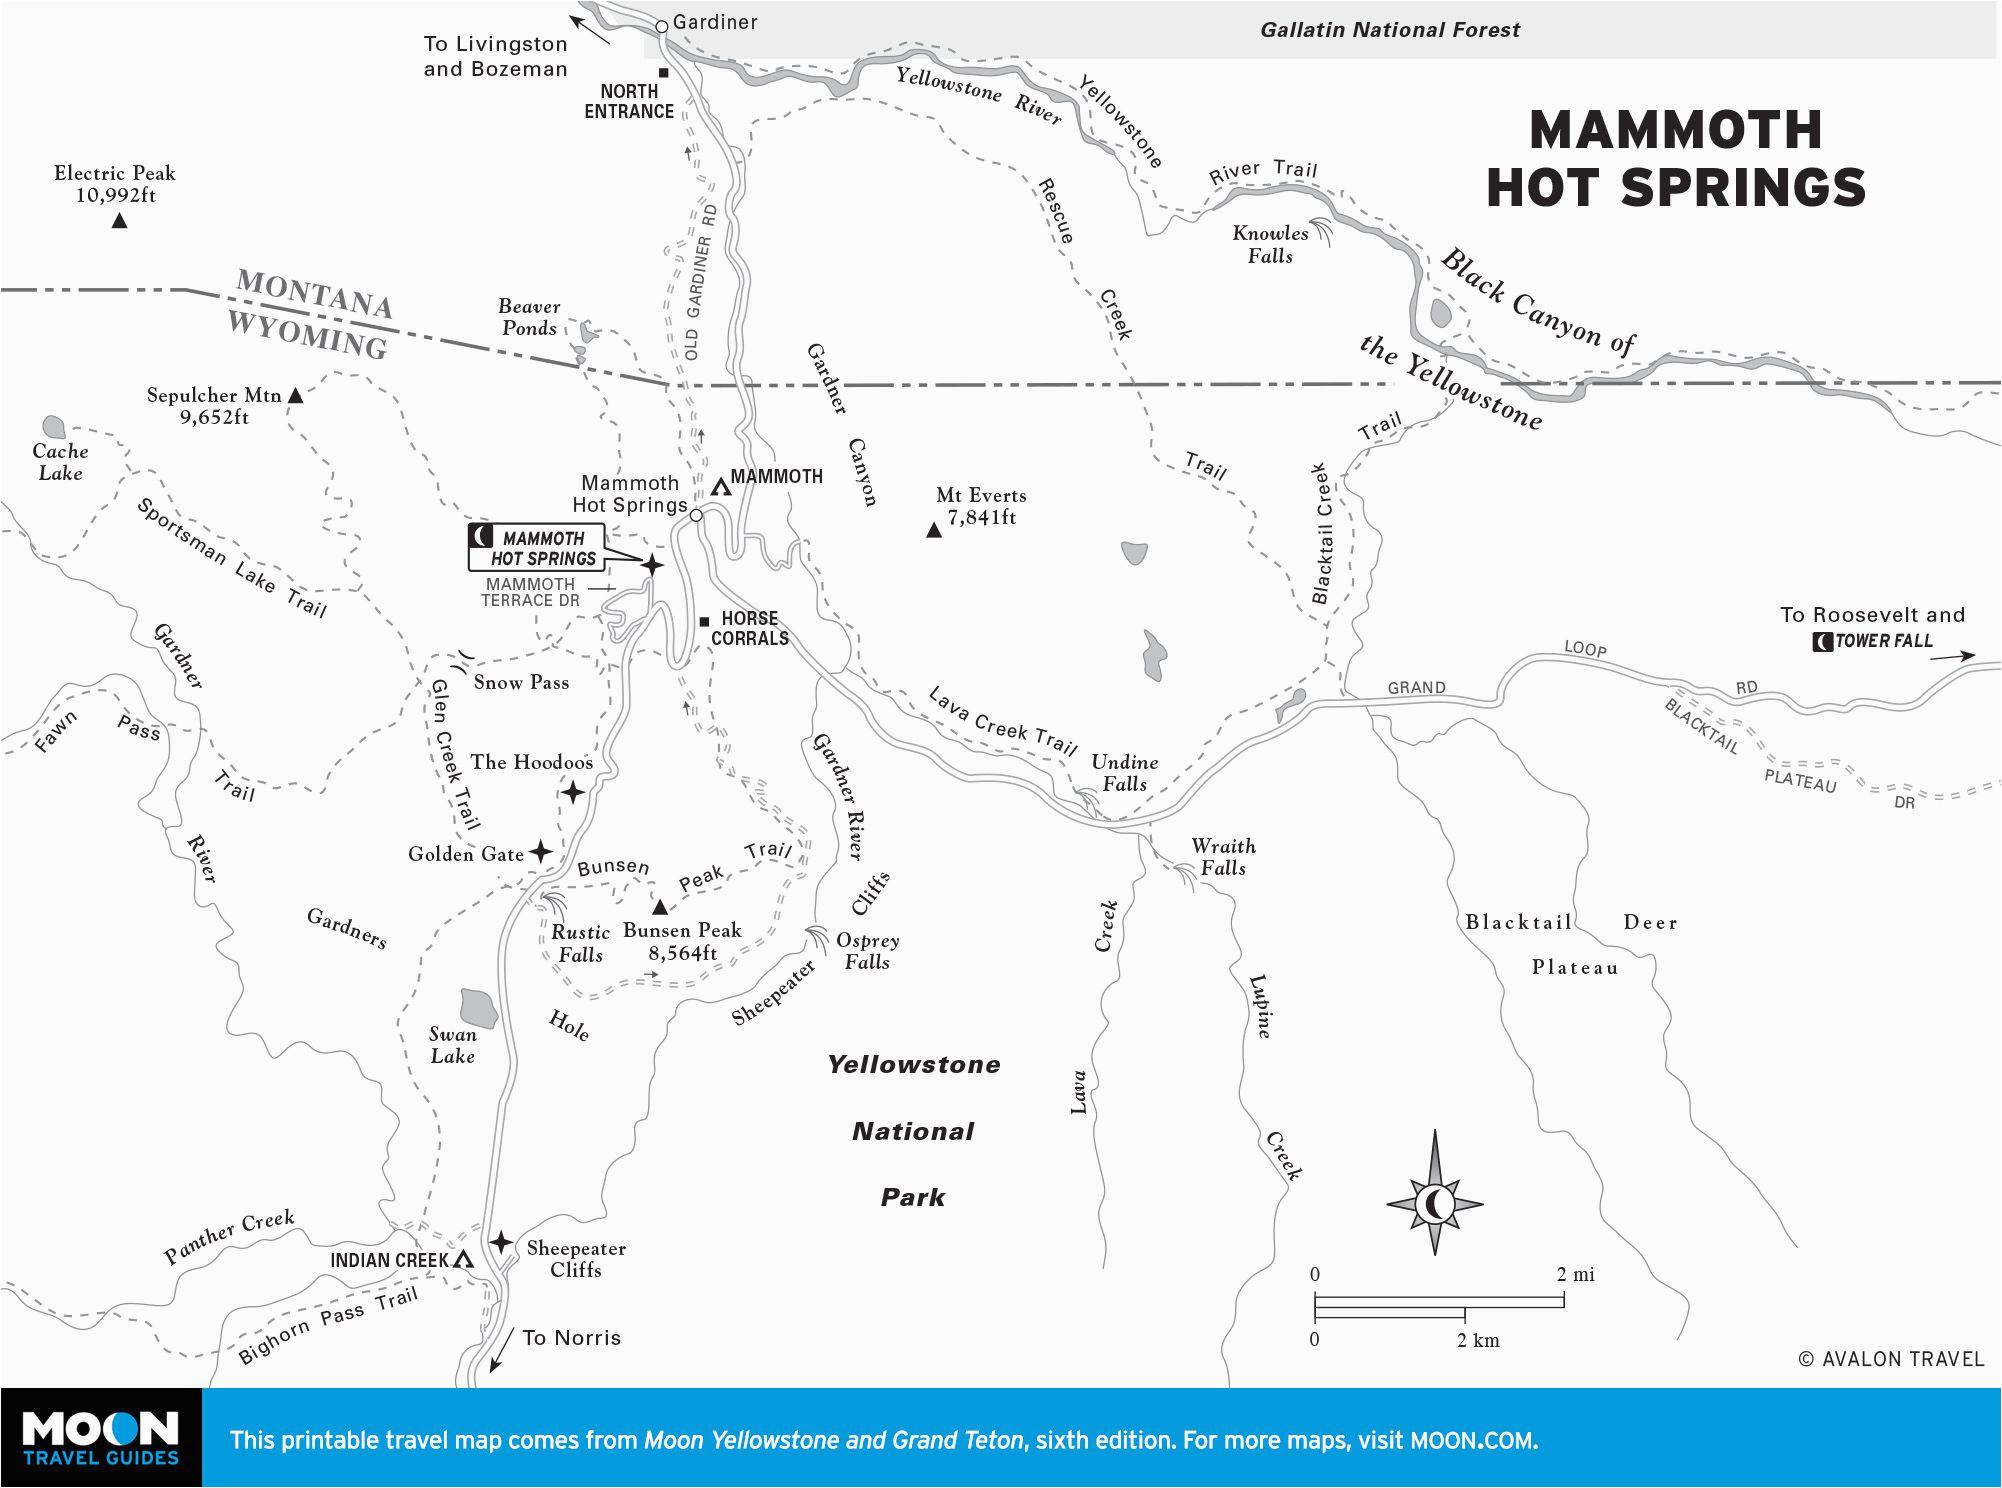 Mammoth Mountain California Map Mammoth California Map ... on goodyear california map, fun california map, highway 395 oregon map, california lakes map, flagstaff california map, california on map, outlet mall california map, arizona strip visitor map, big bear california map, aspen colorado map, san manuel california map, buckeye california map, southern california map, coolidge california map, pacific coast highway 1 california map, whistler backcountry map, miami california map, old highway 80 california map, phoenix california map, peoria california map,